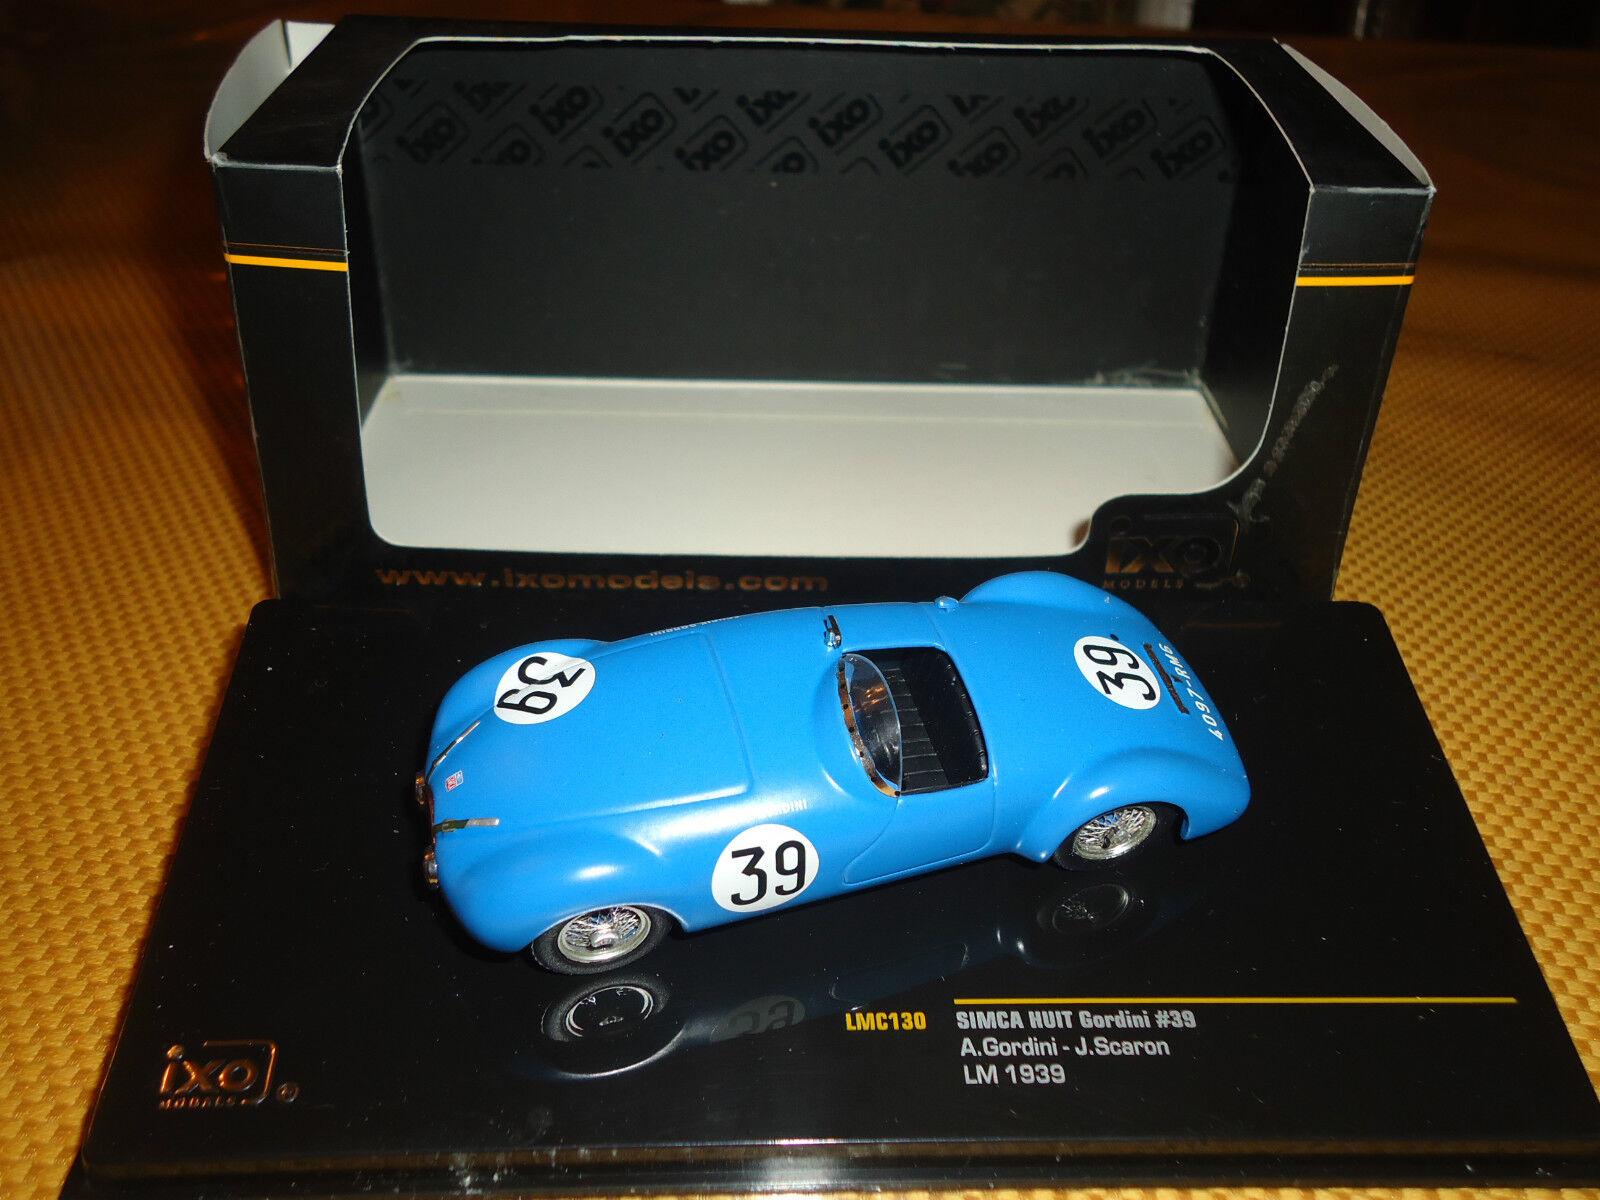 Ixo 1 43 Simca Huit Gordini  39 Le Mans 1939